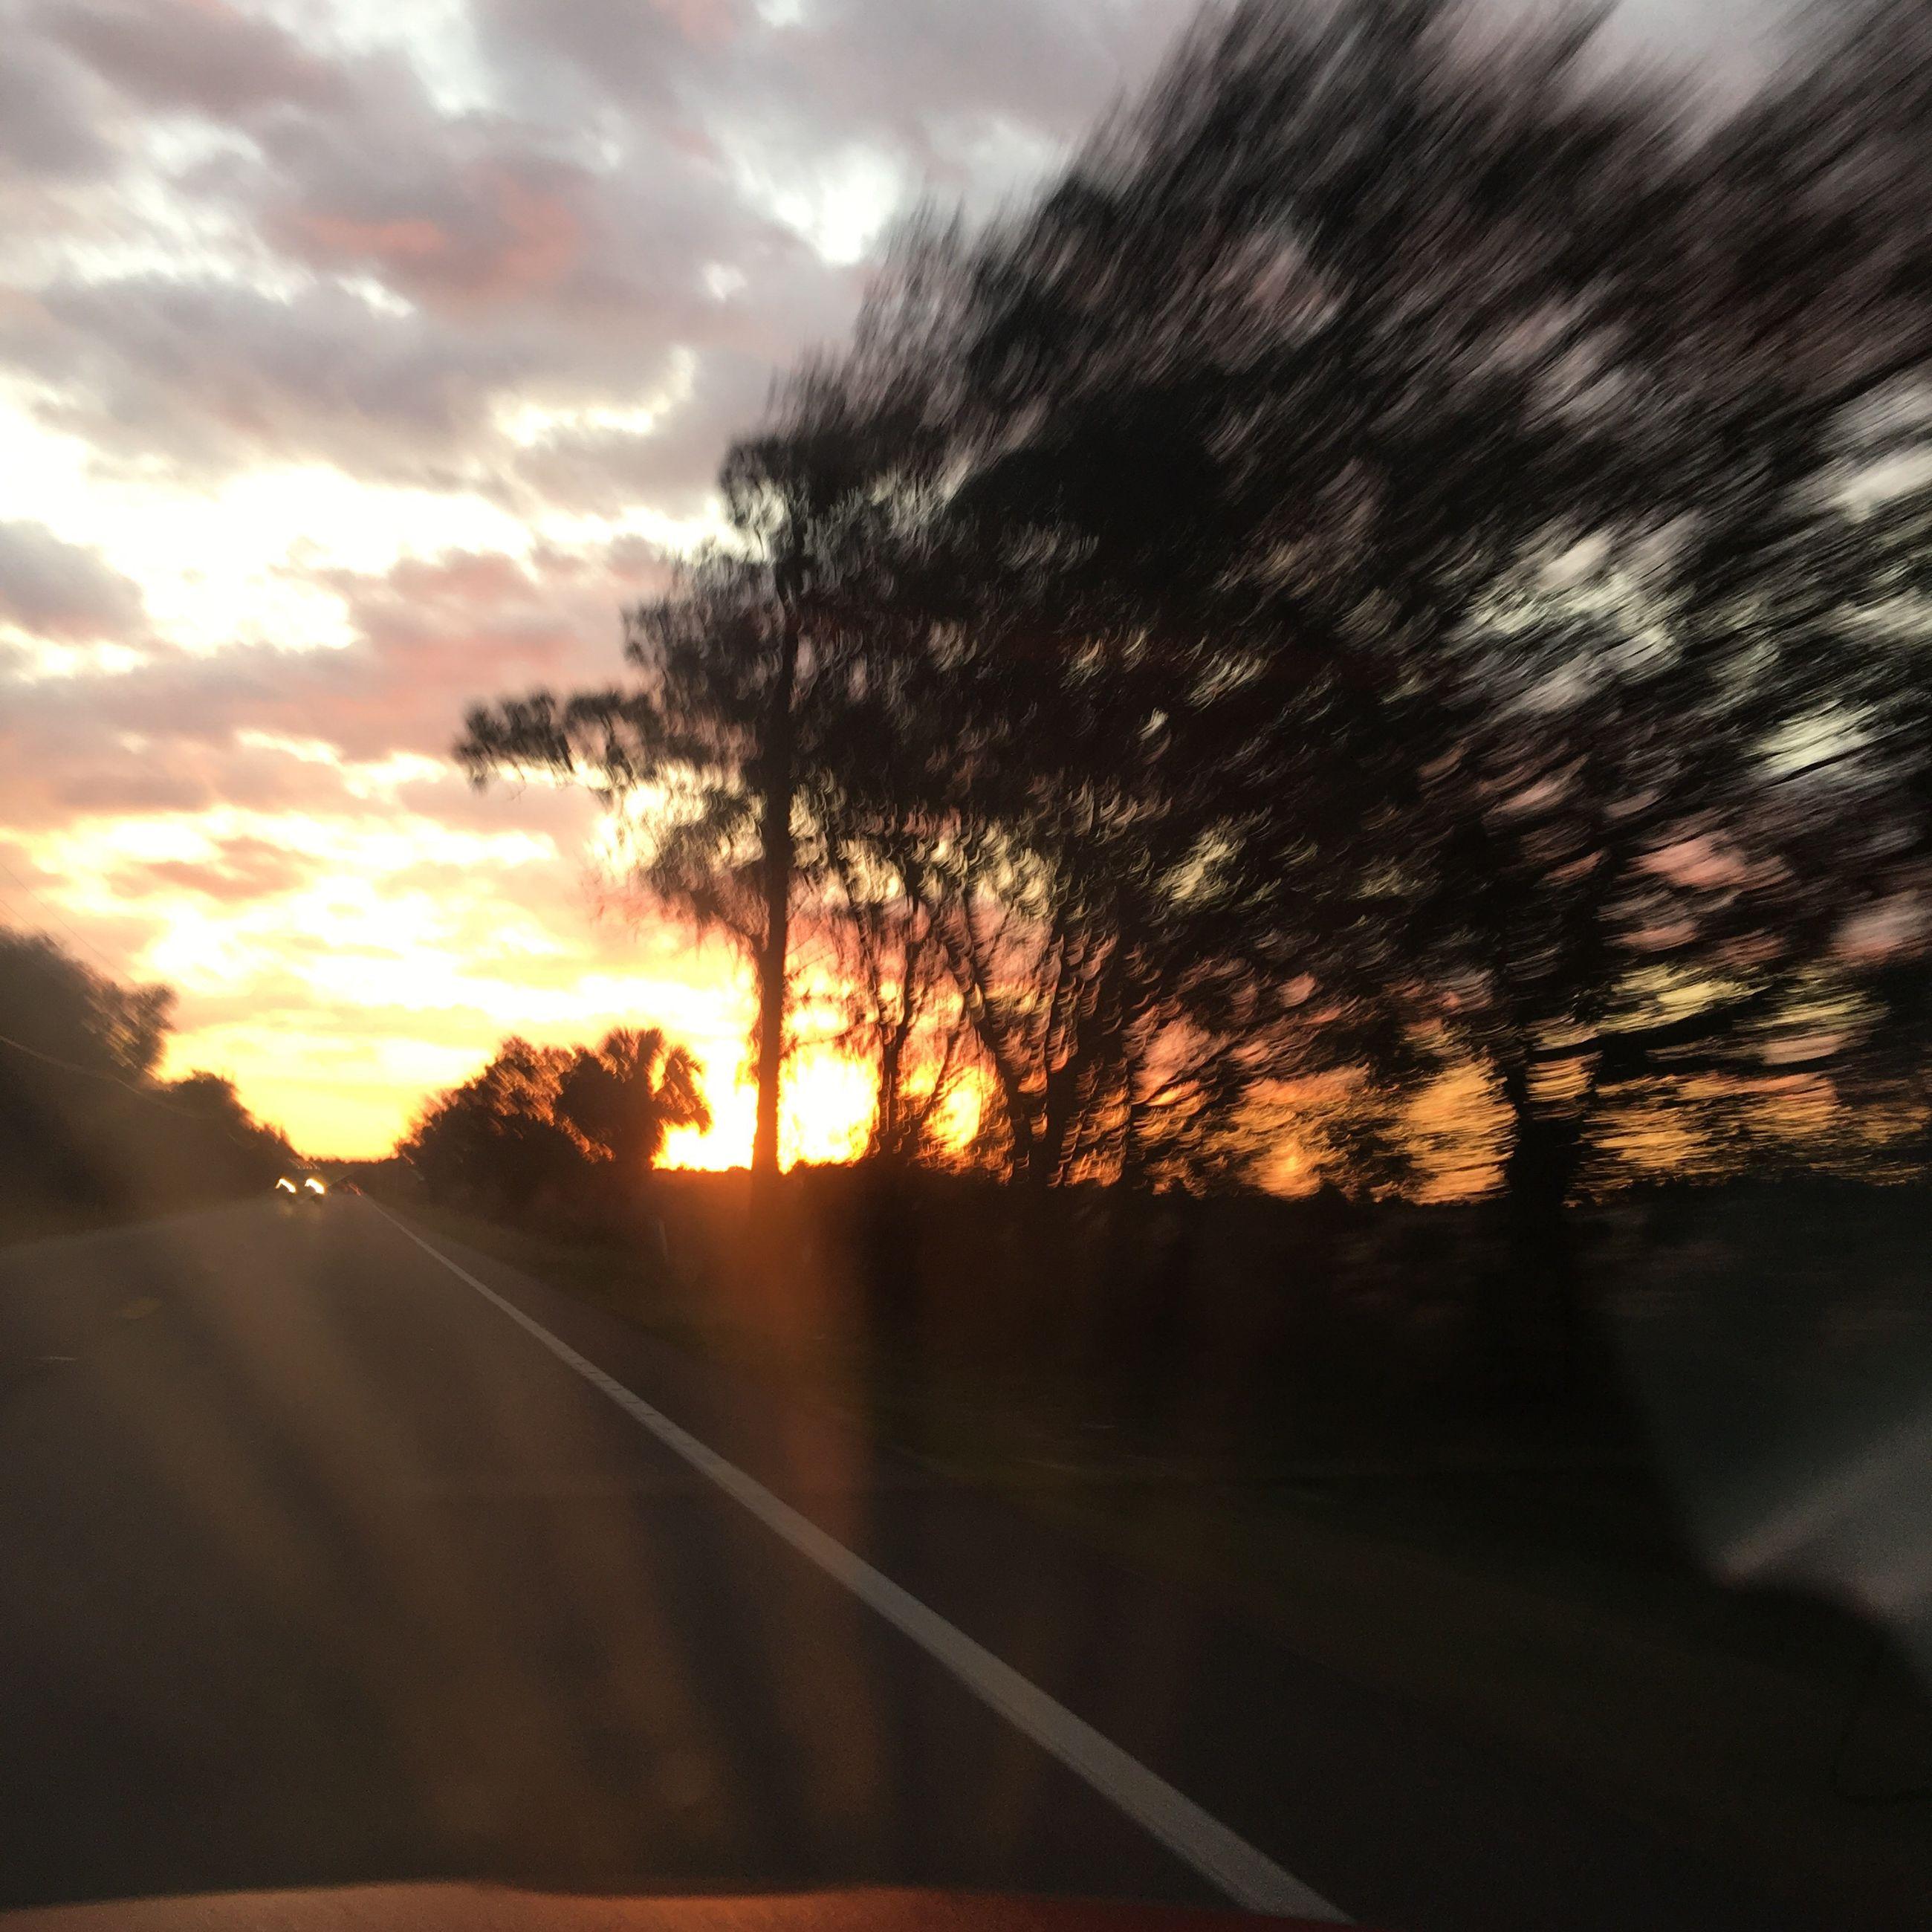 sunset, transportation, road, sky, tree, car, sun, silhouette, the way forward, orange color, cloud - sky, sunlight, land vehicle, street, road marking, mode of transport, sunbeam, cloud, nature, diminishing perspective